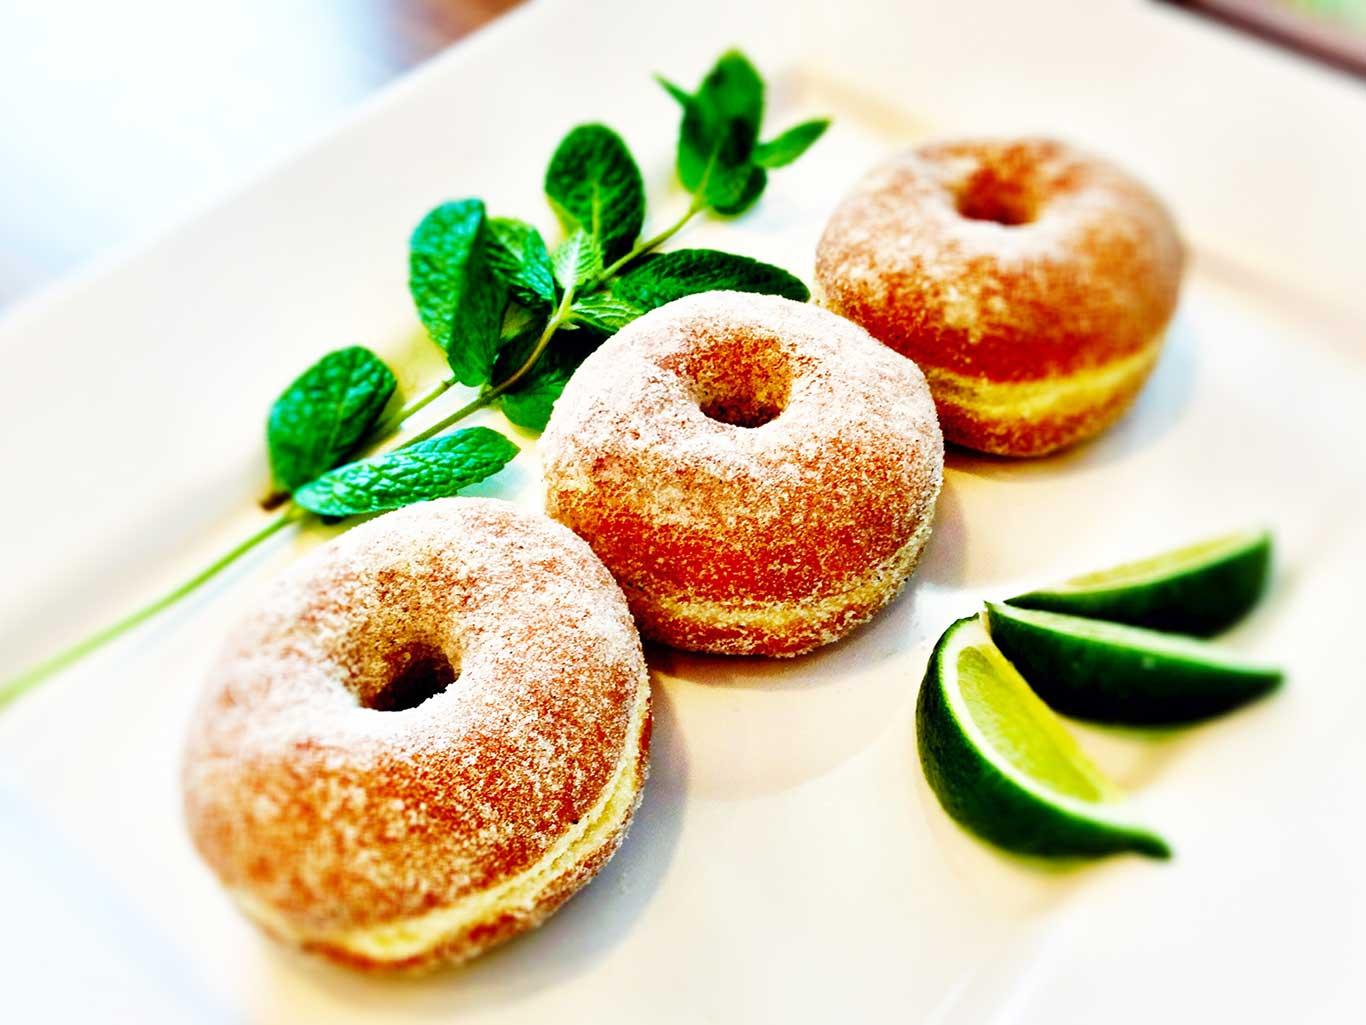 Three sugar donuts